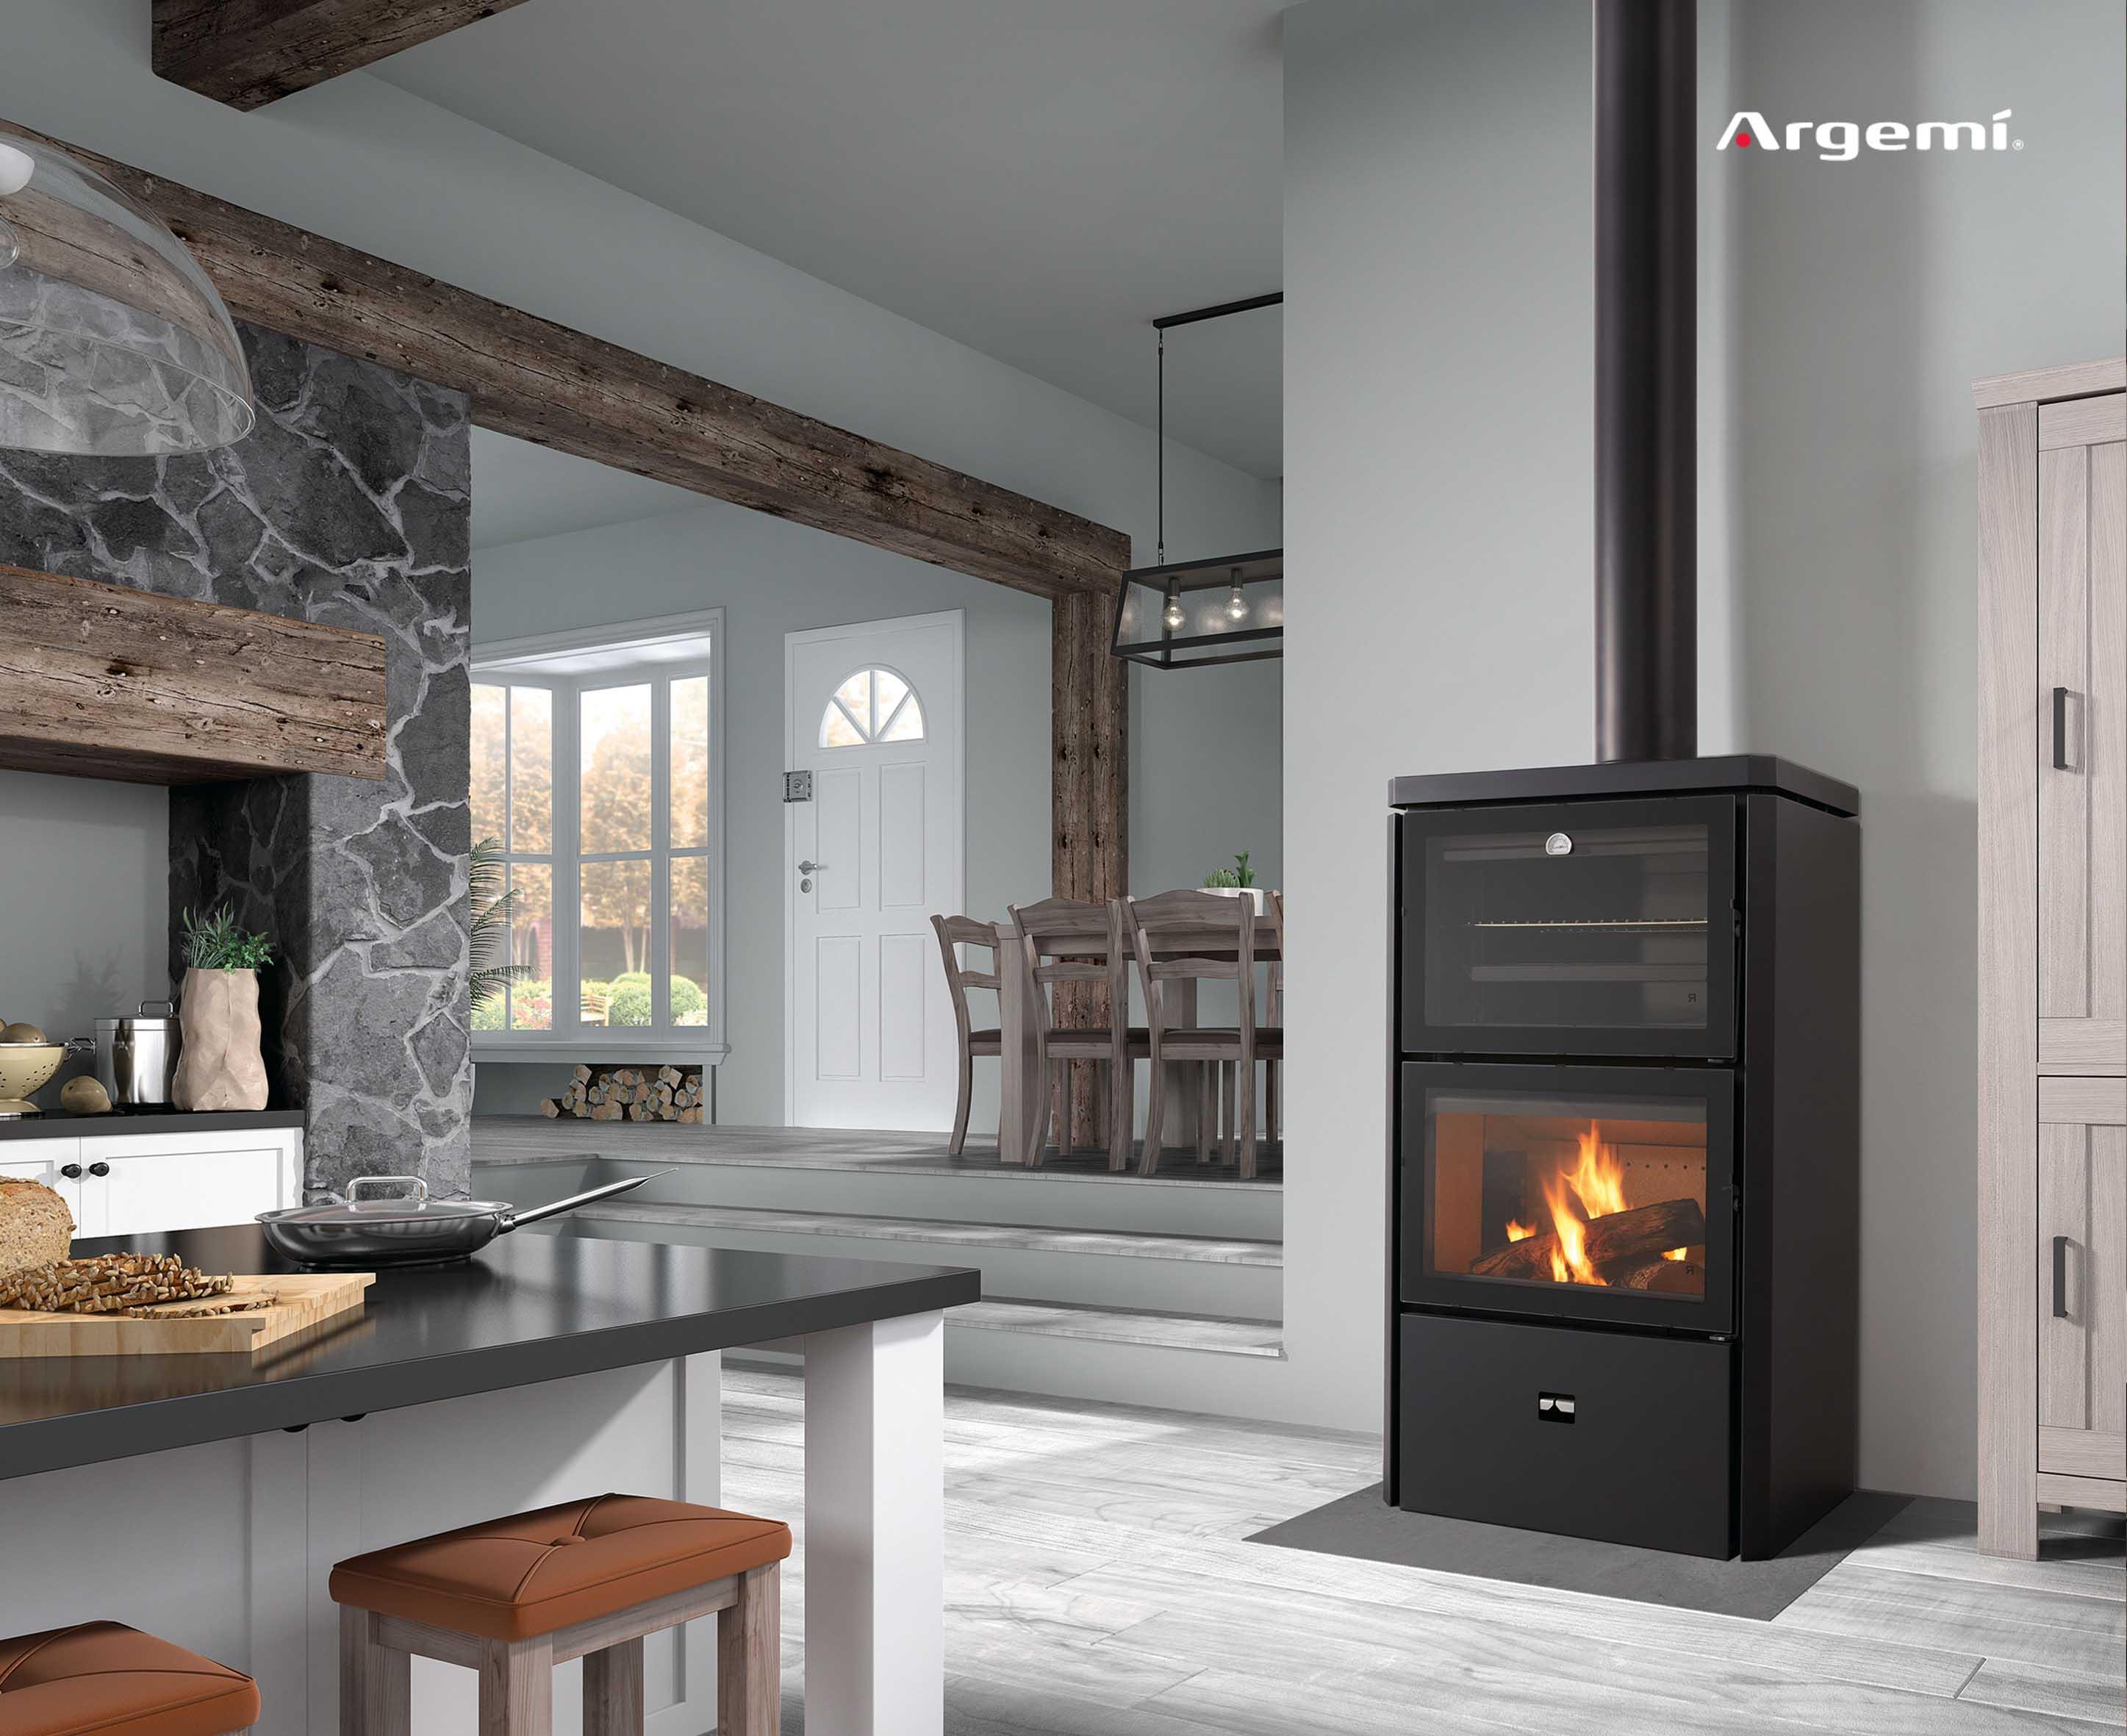 Home - Argemi prefabricatsArgemi prefabricats | Argemi prefabricats